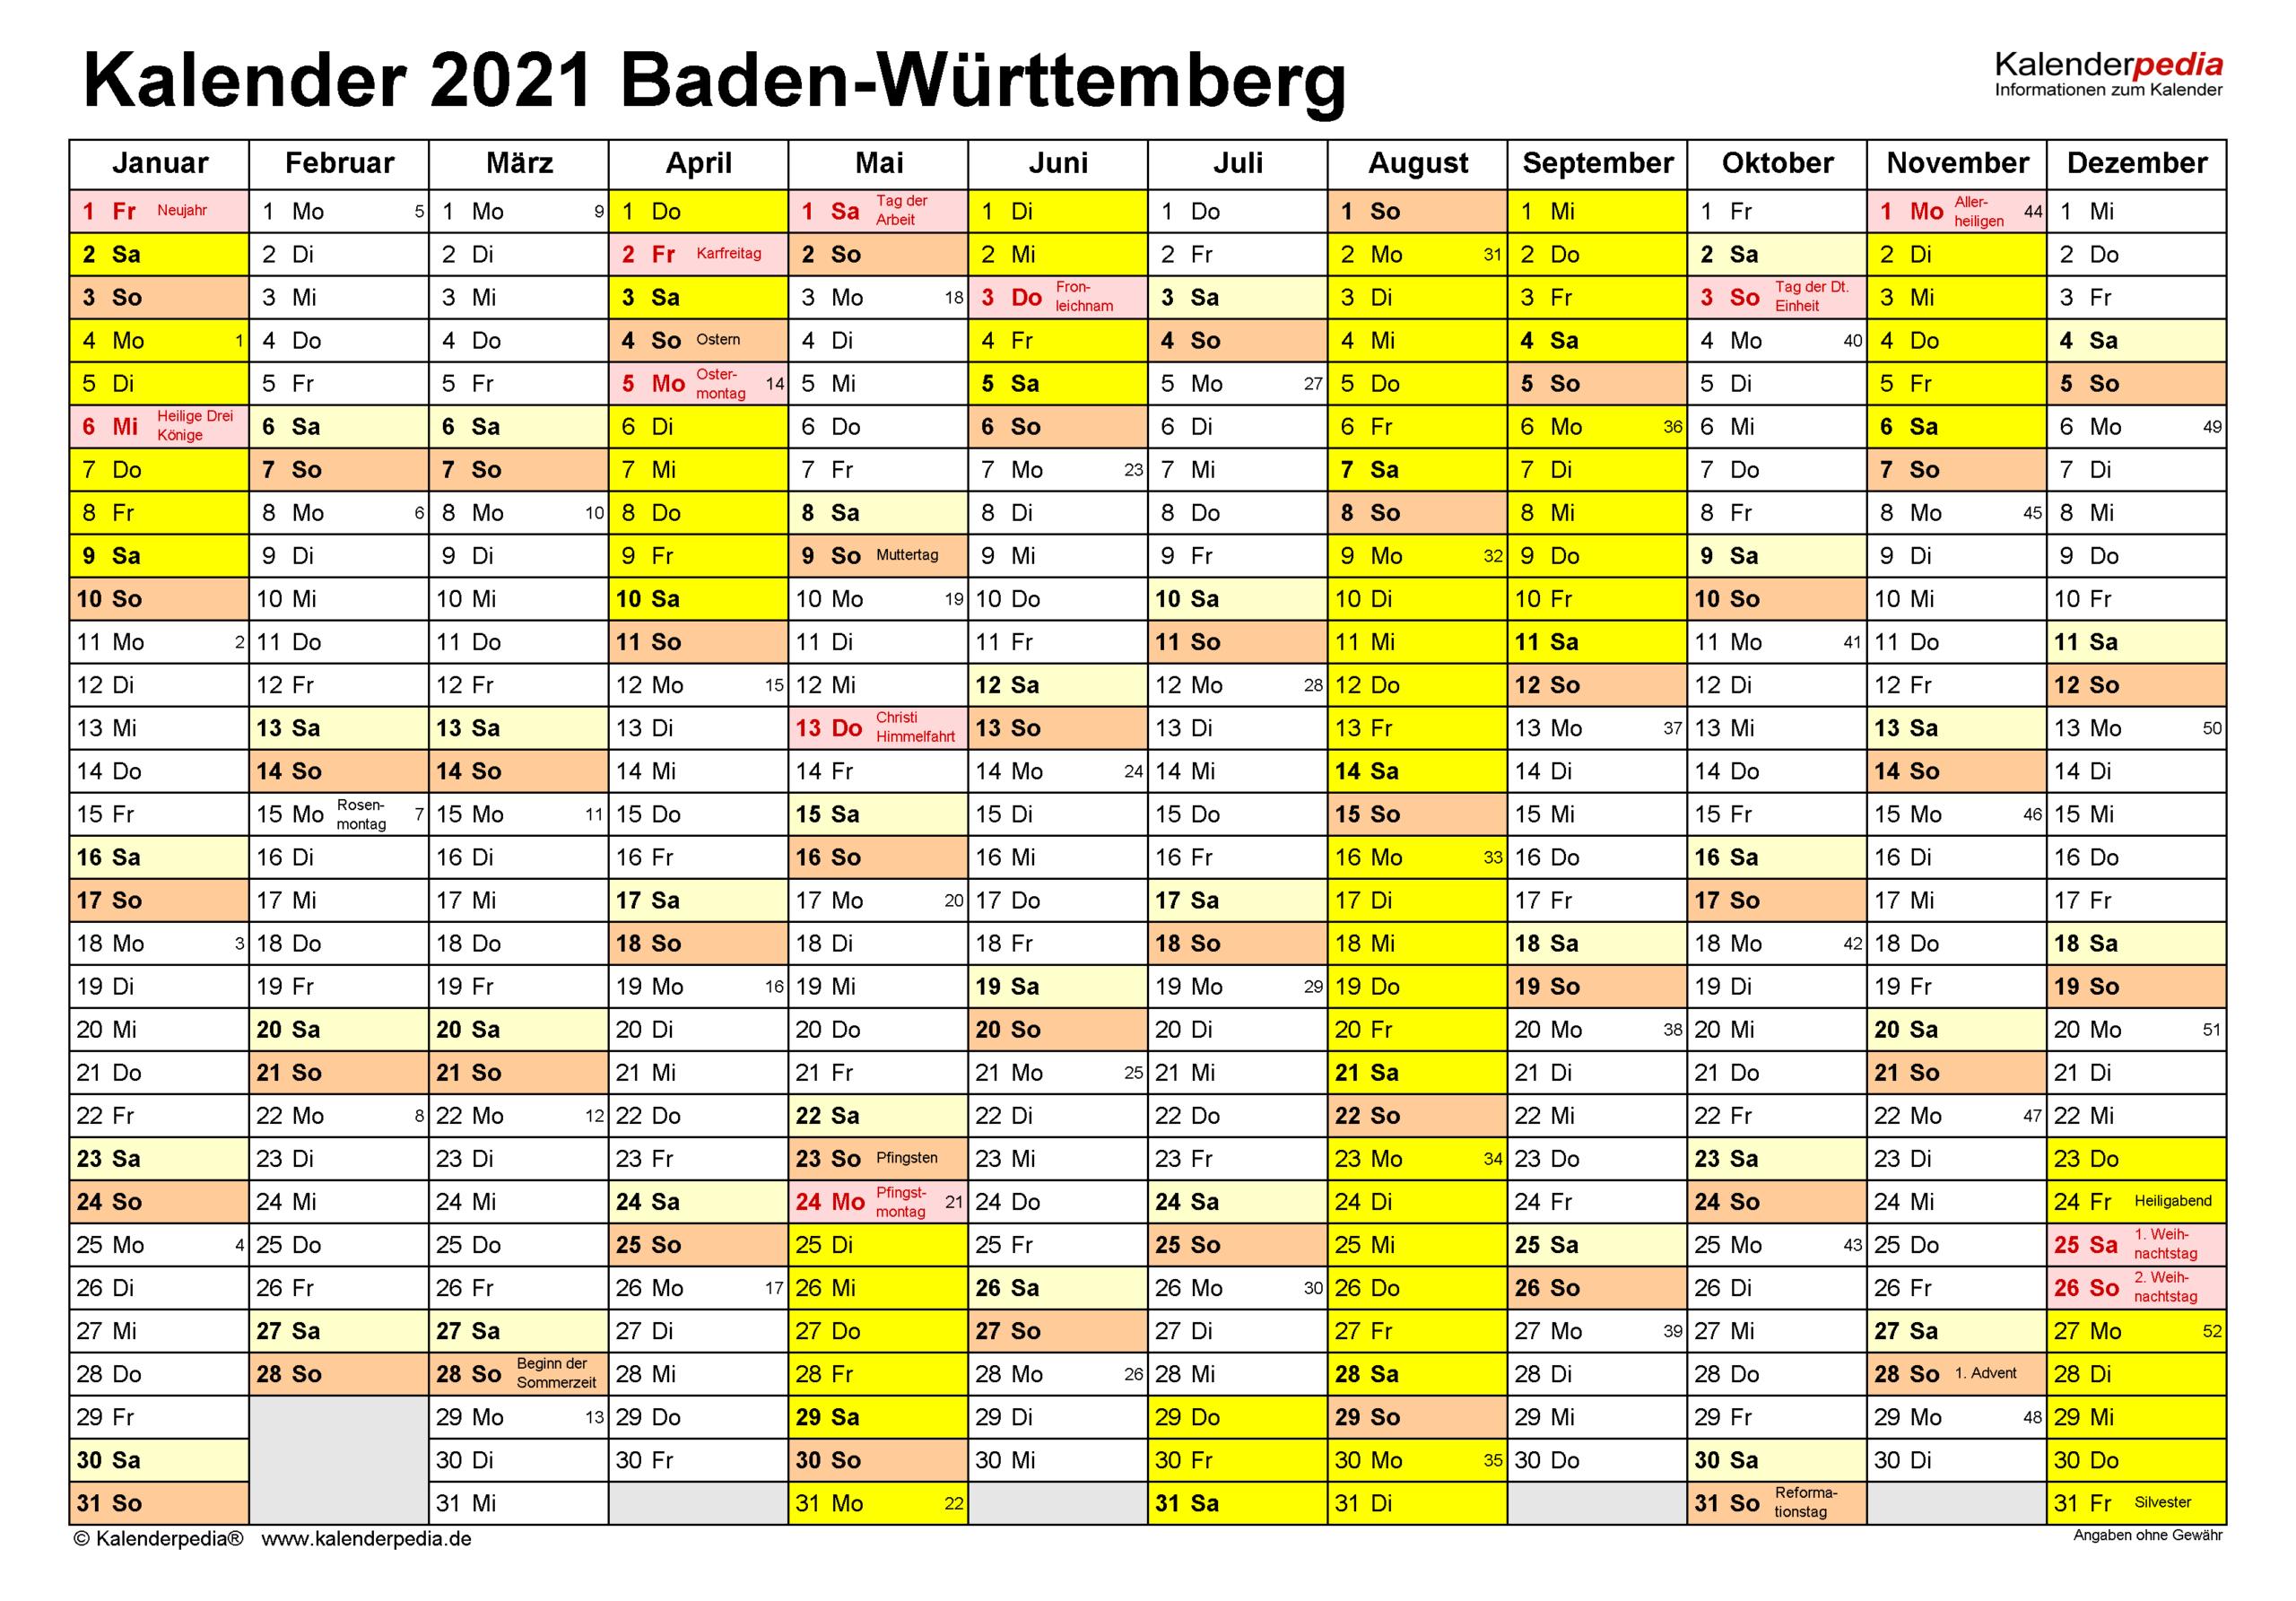 Kalender 2021 Baden-Württemberg: Ferien, Feiertage, Excel